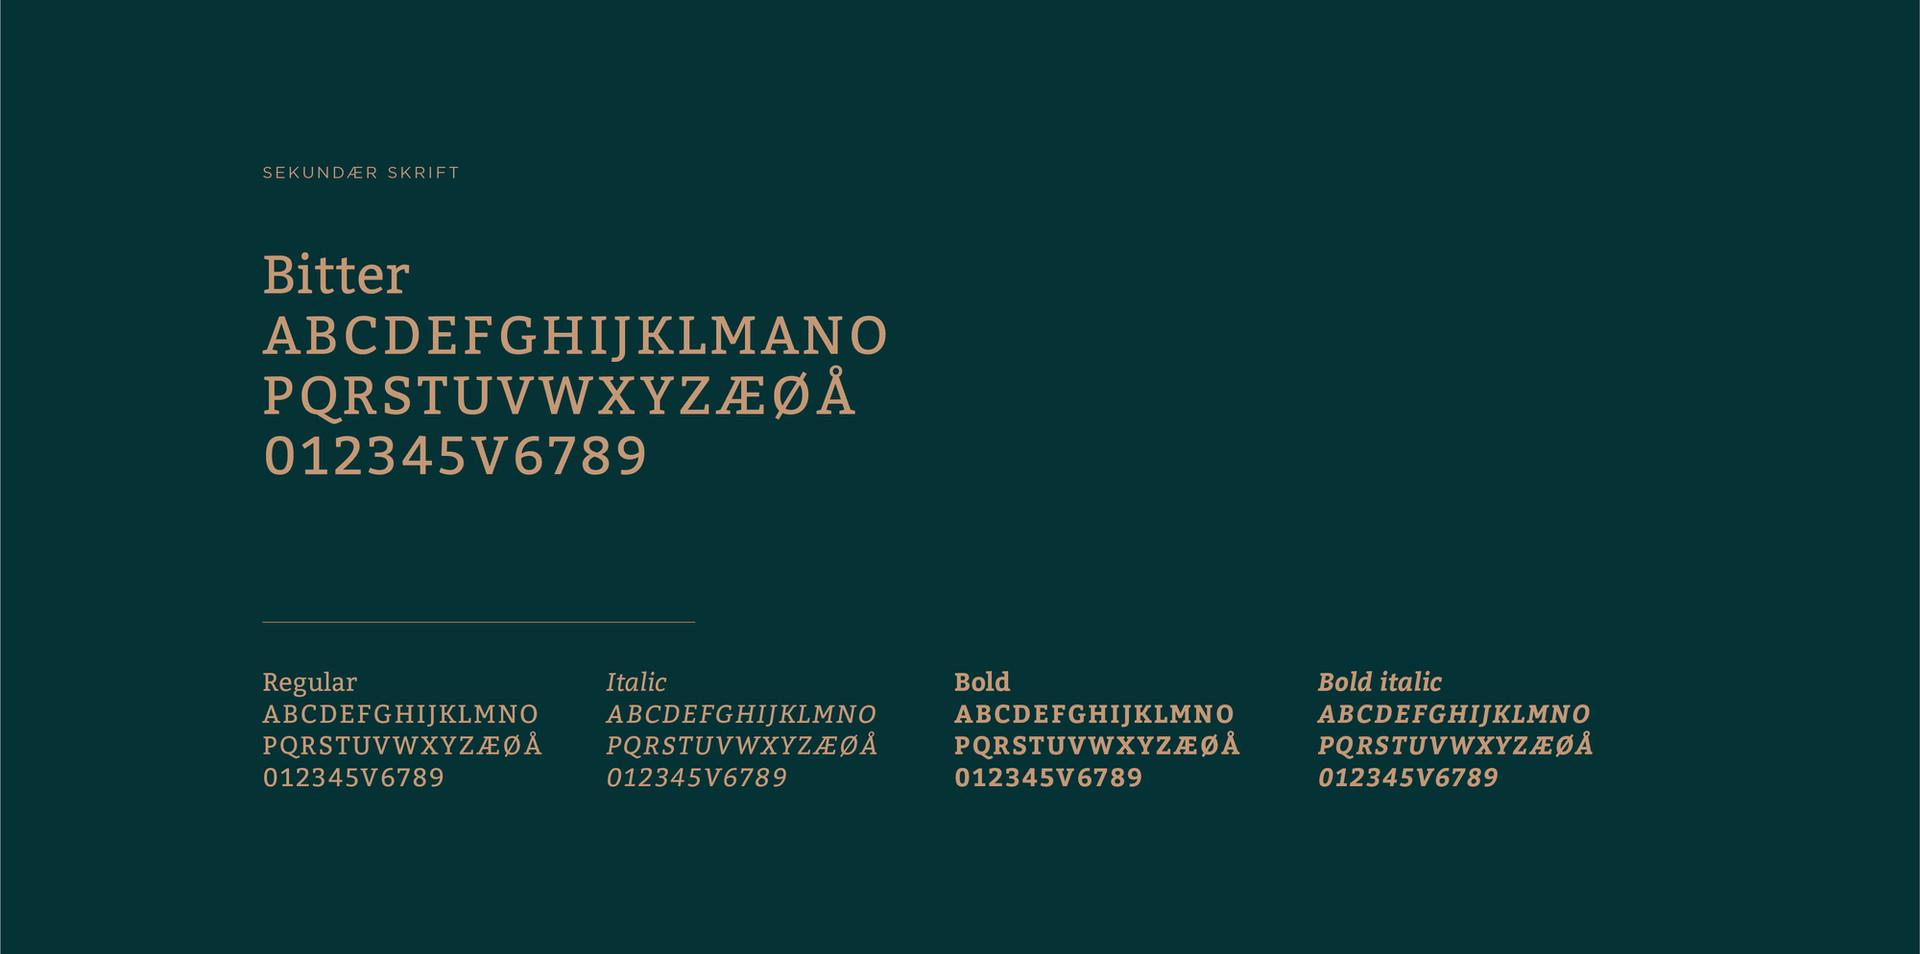 Anlaegsgartner_MP_visual_identity_typogr